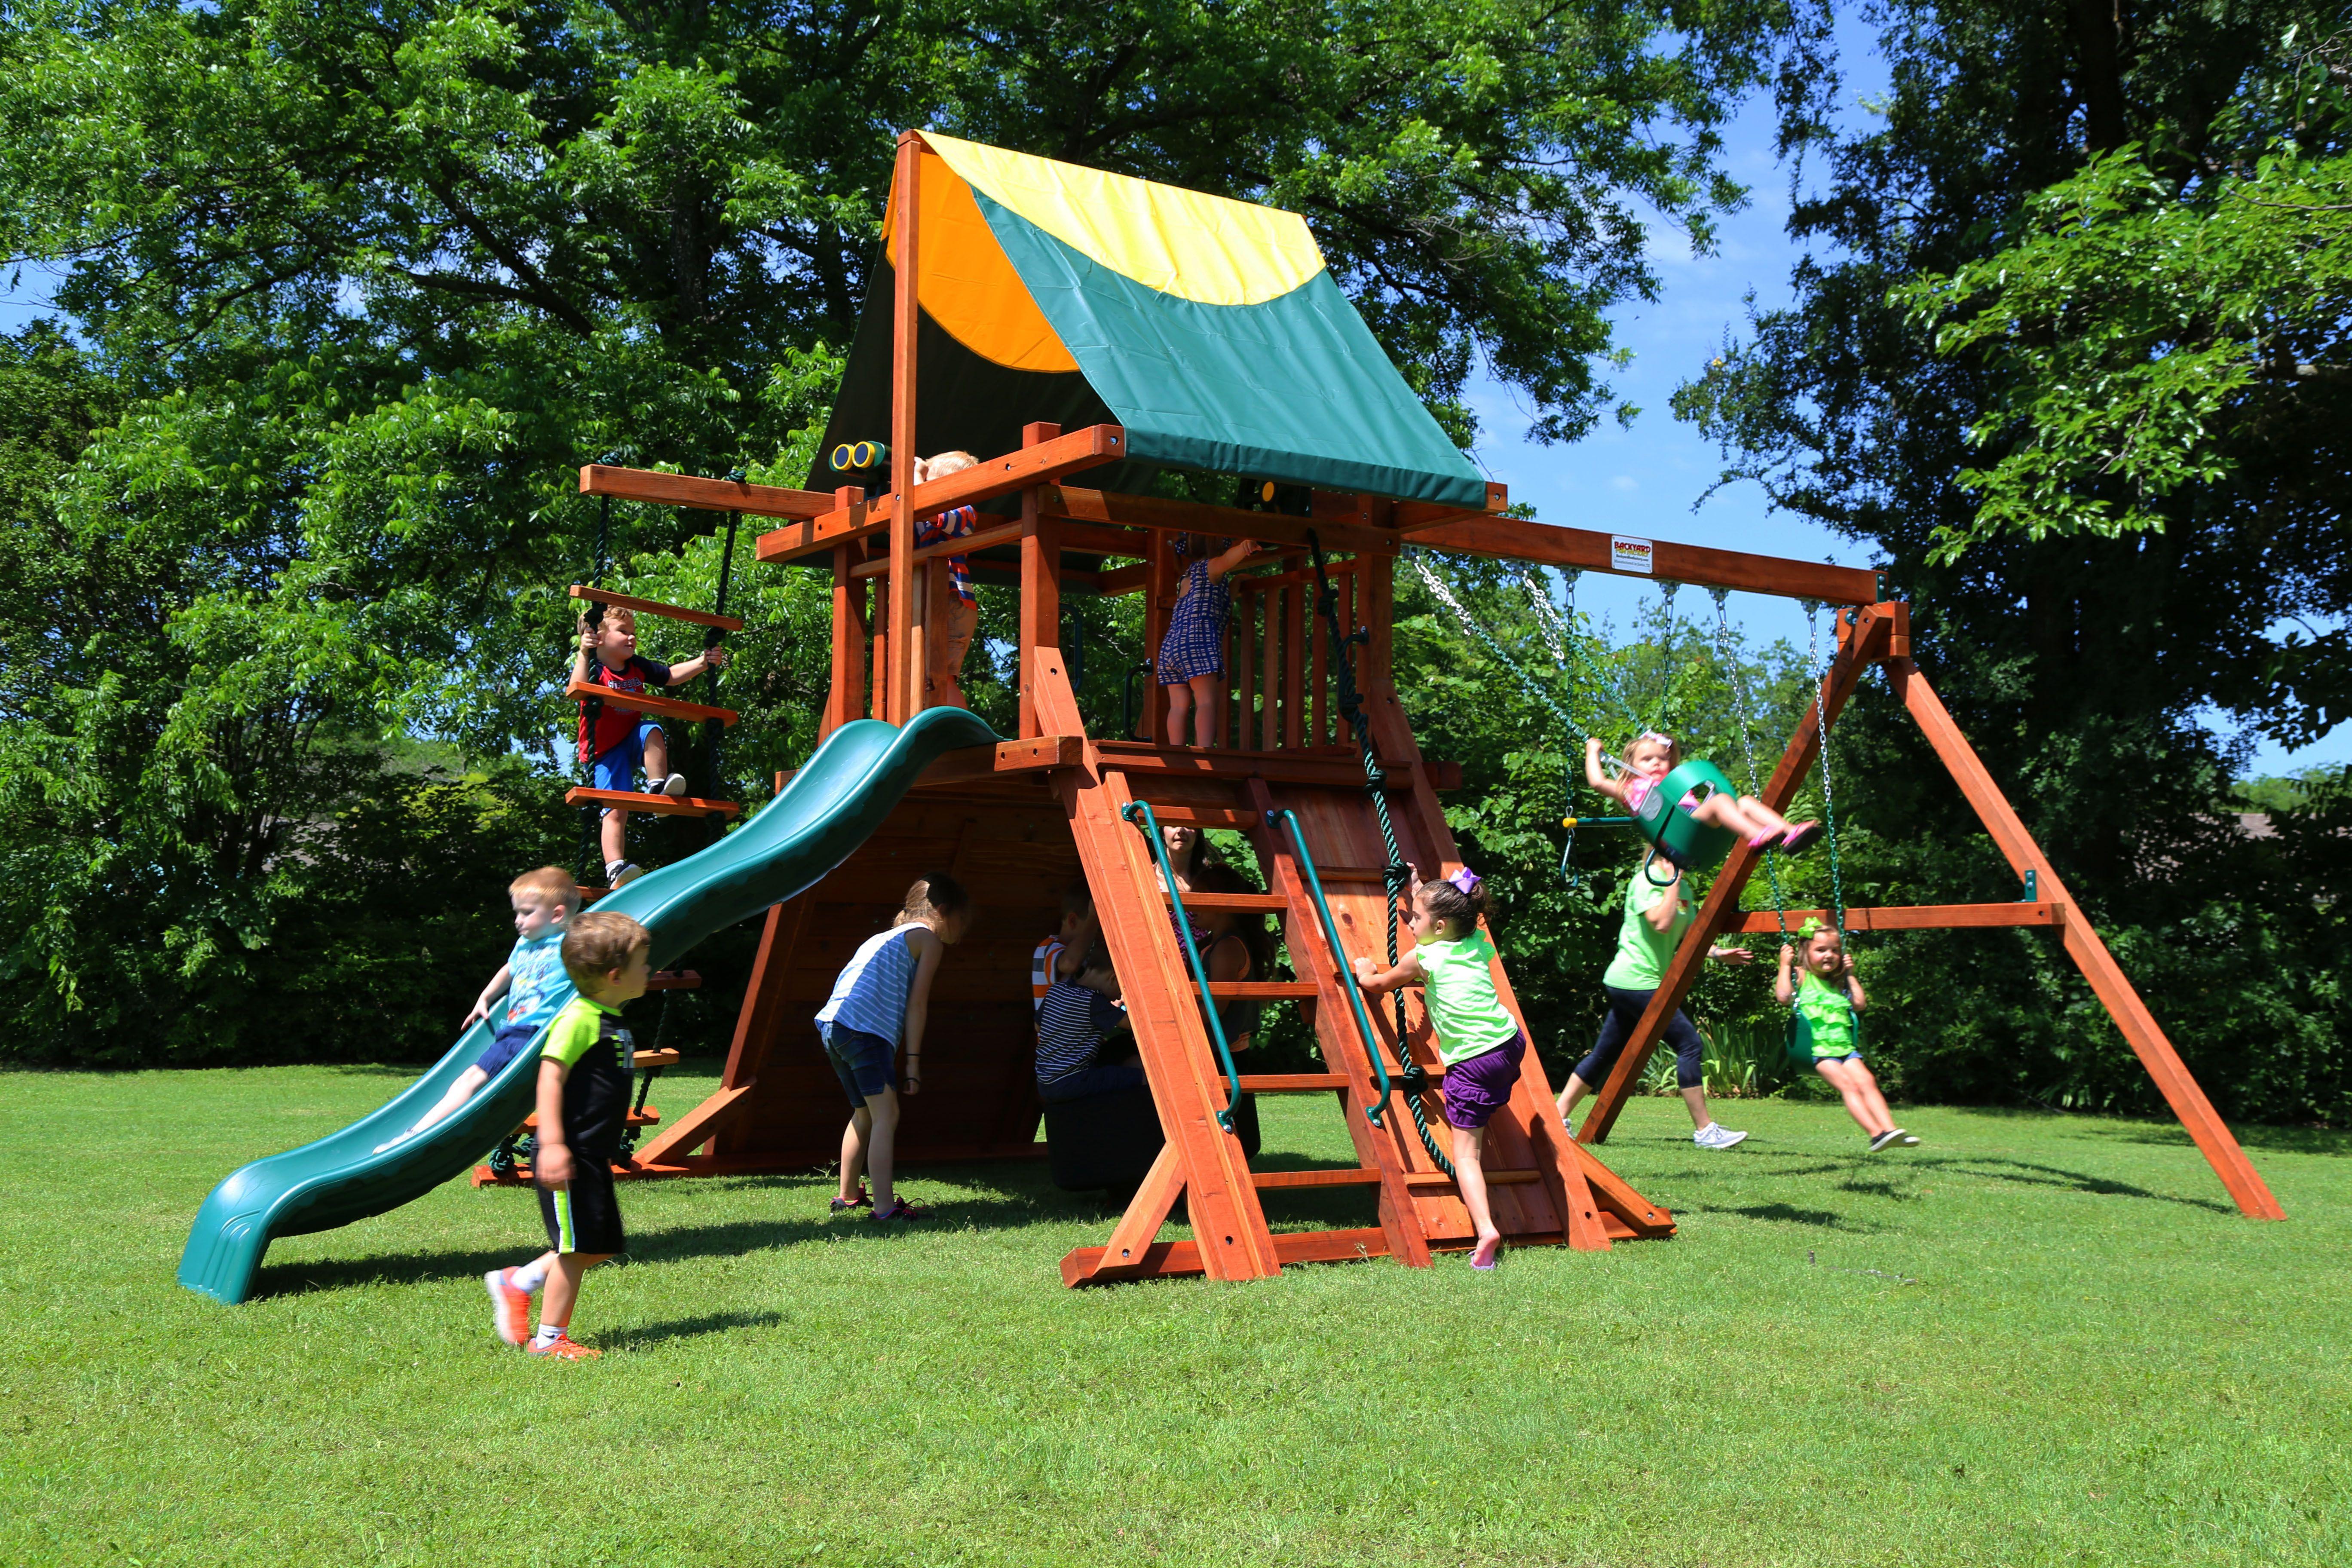 Rustler playset for younger children. #swingset #playset # ...